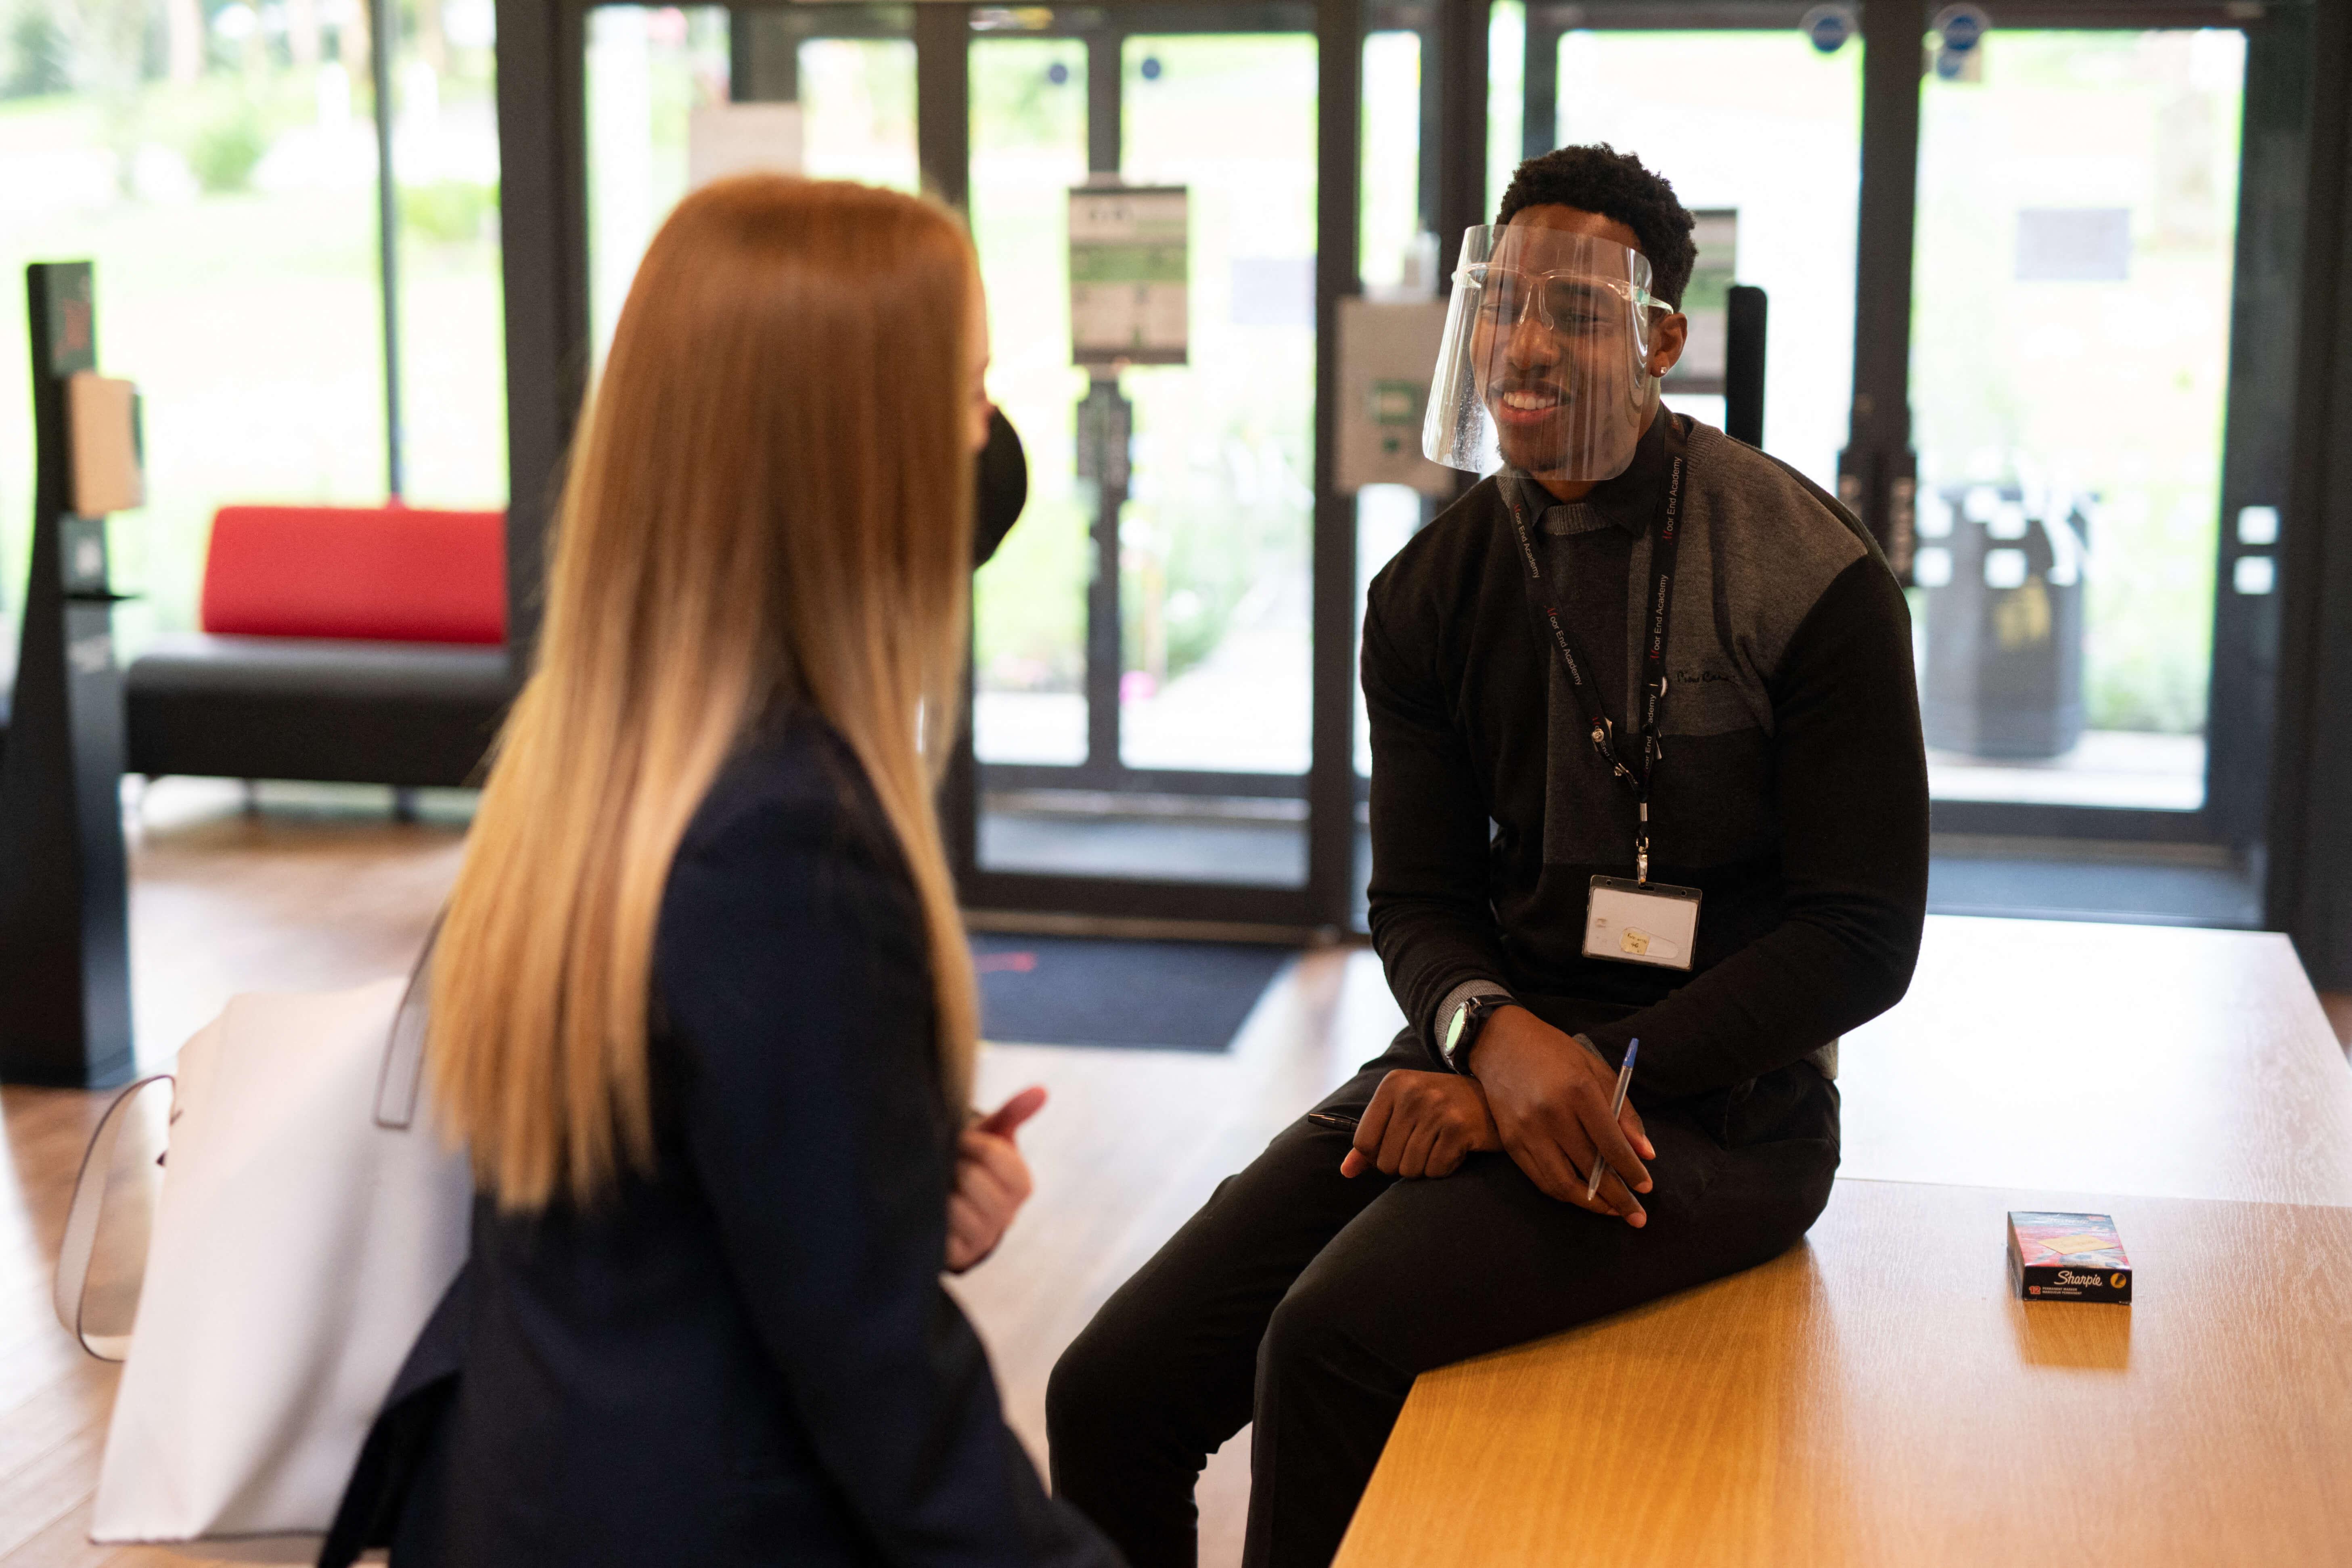 Teachers to decide GCSE and A Level 2021 grades